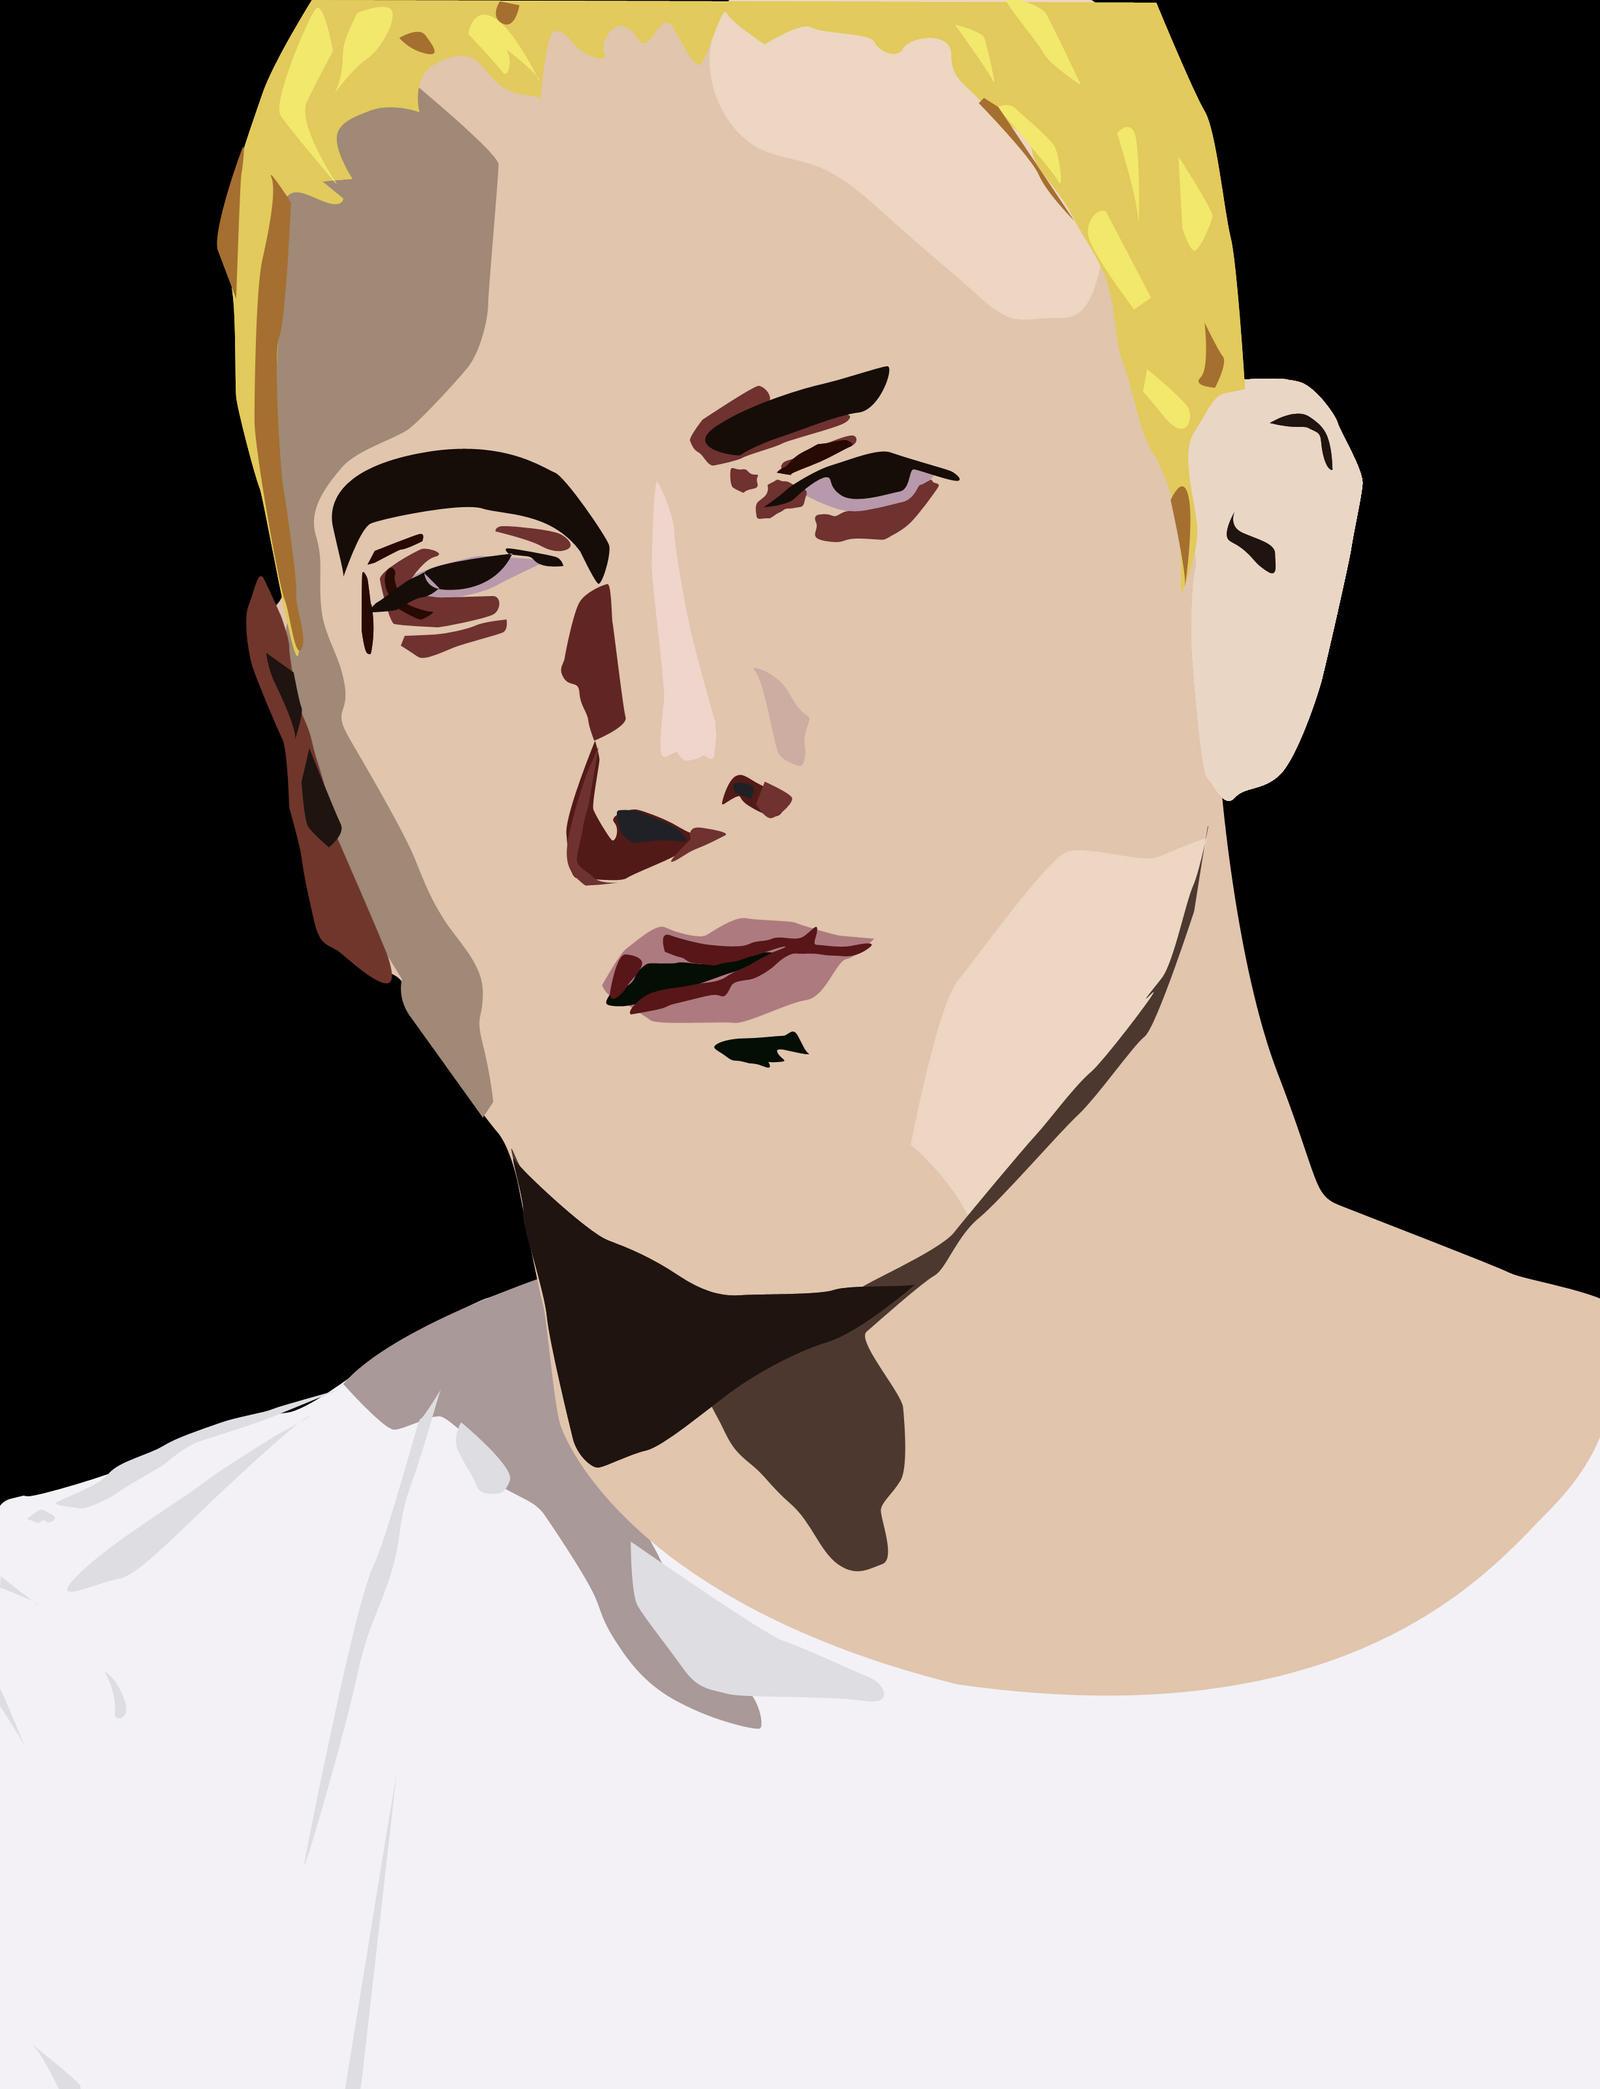 Eminem art